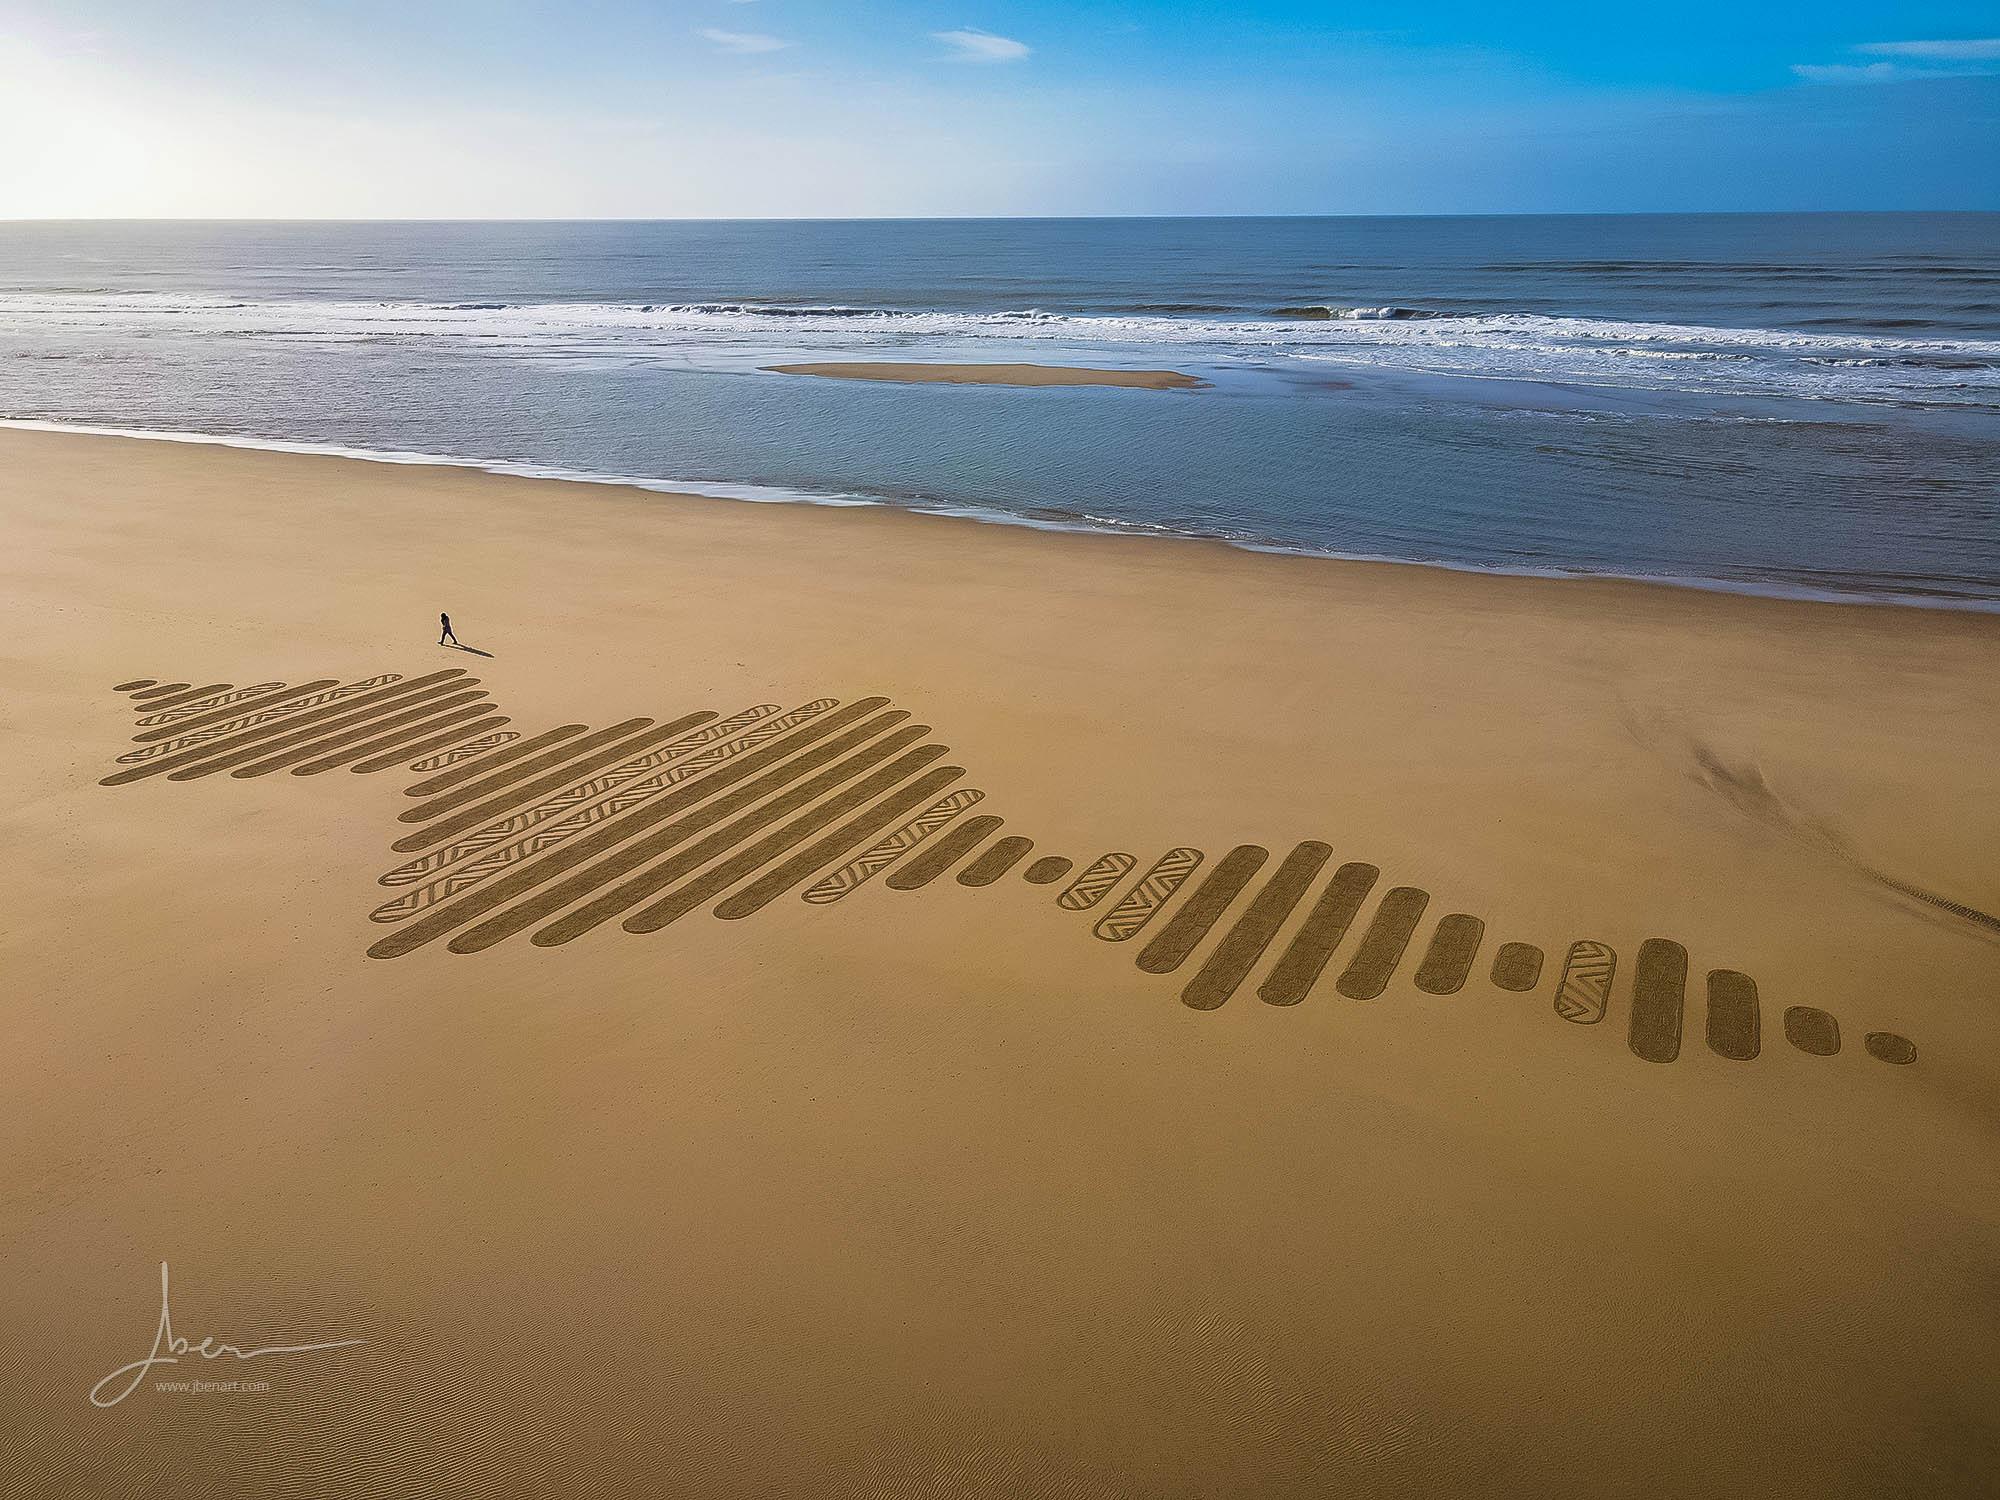 Beach art ondes sonores